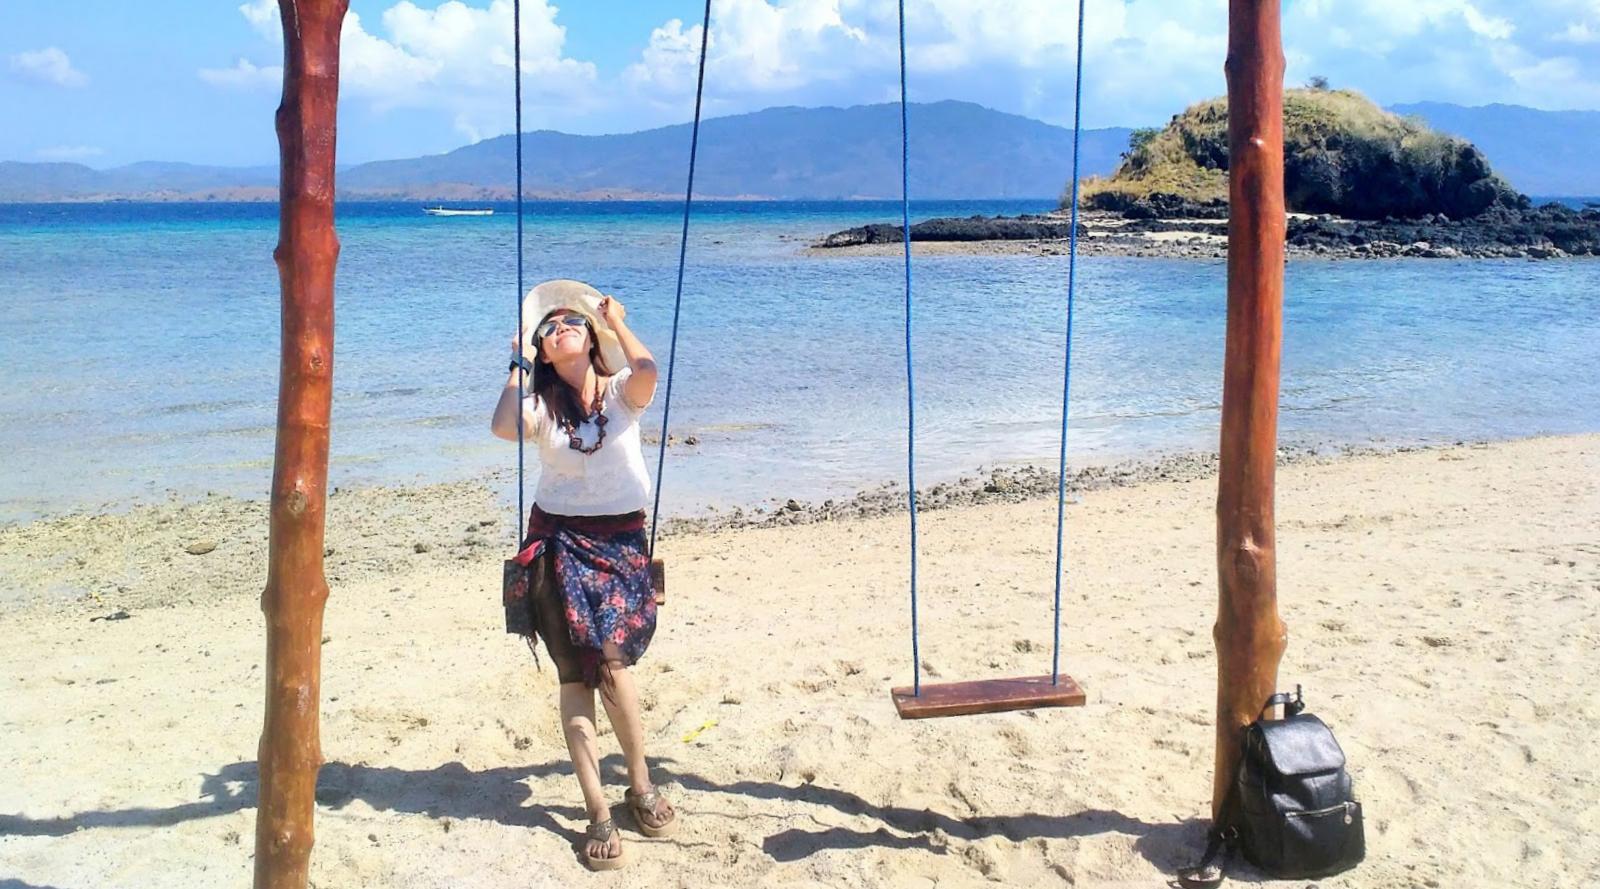 cewek cantik dan manis Wisata Pulau Nisa Pudu - NTB